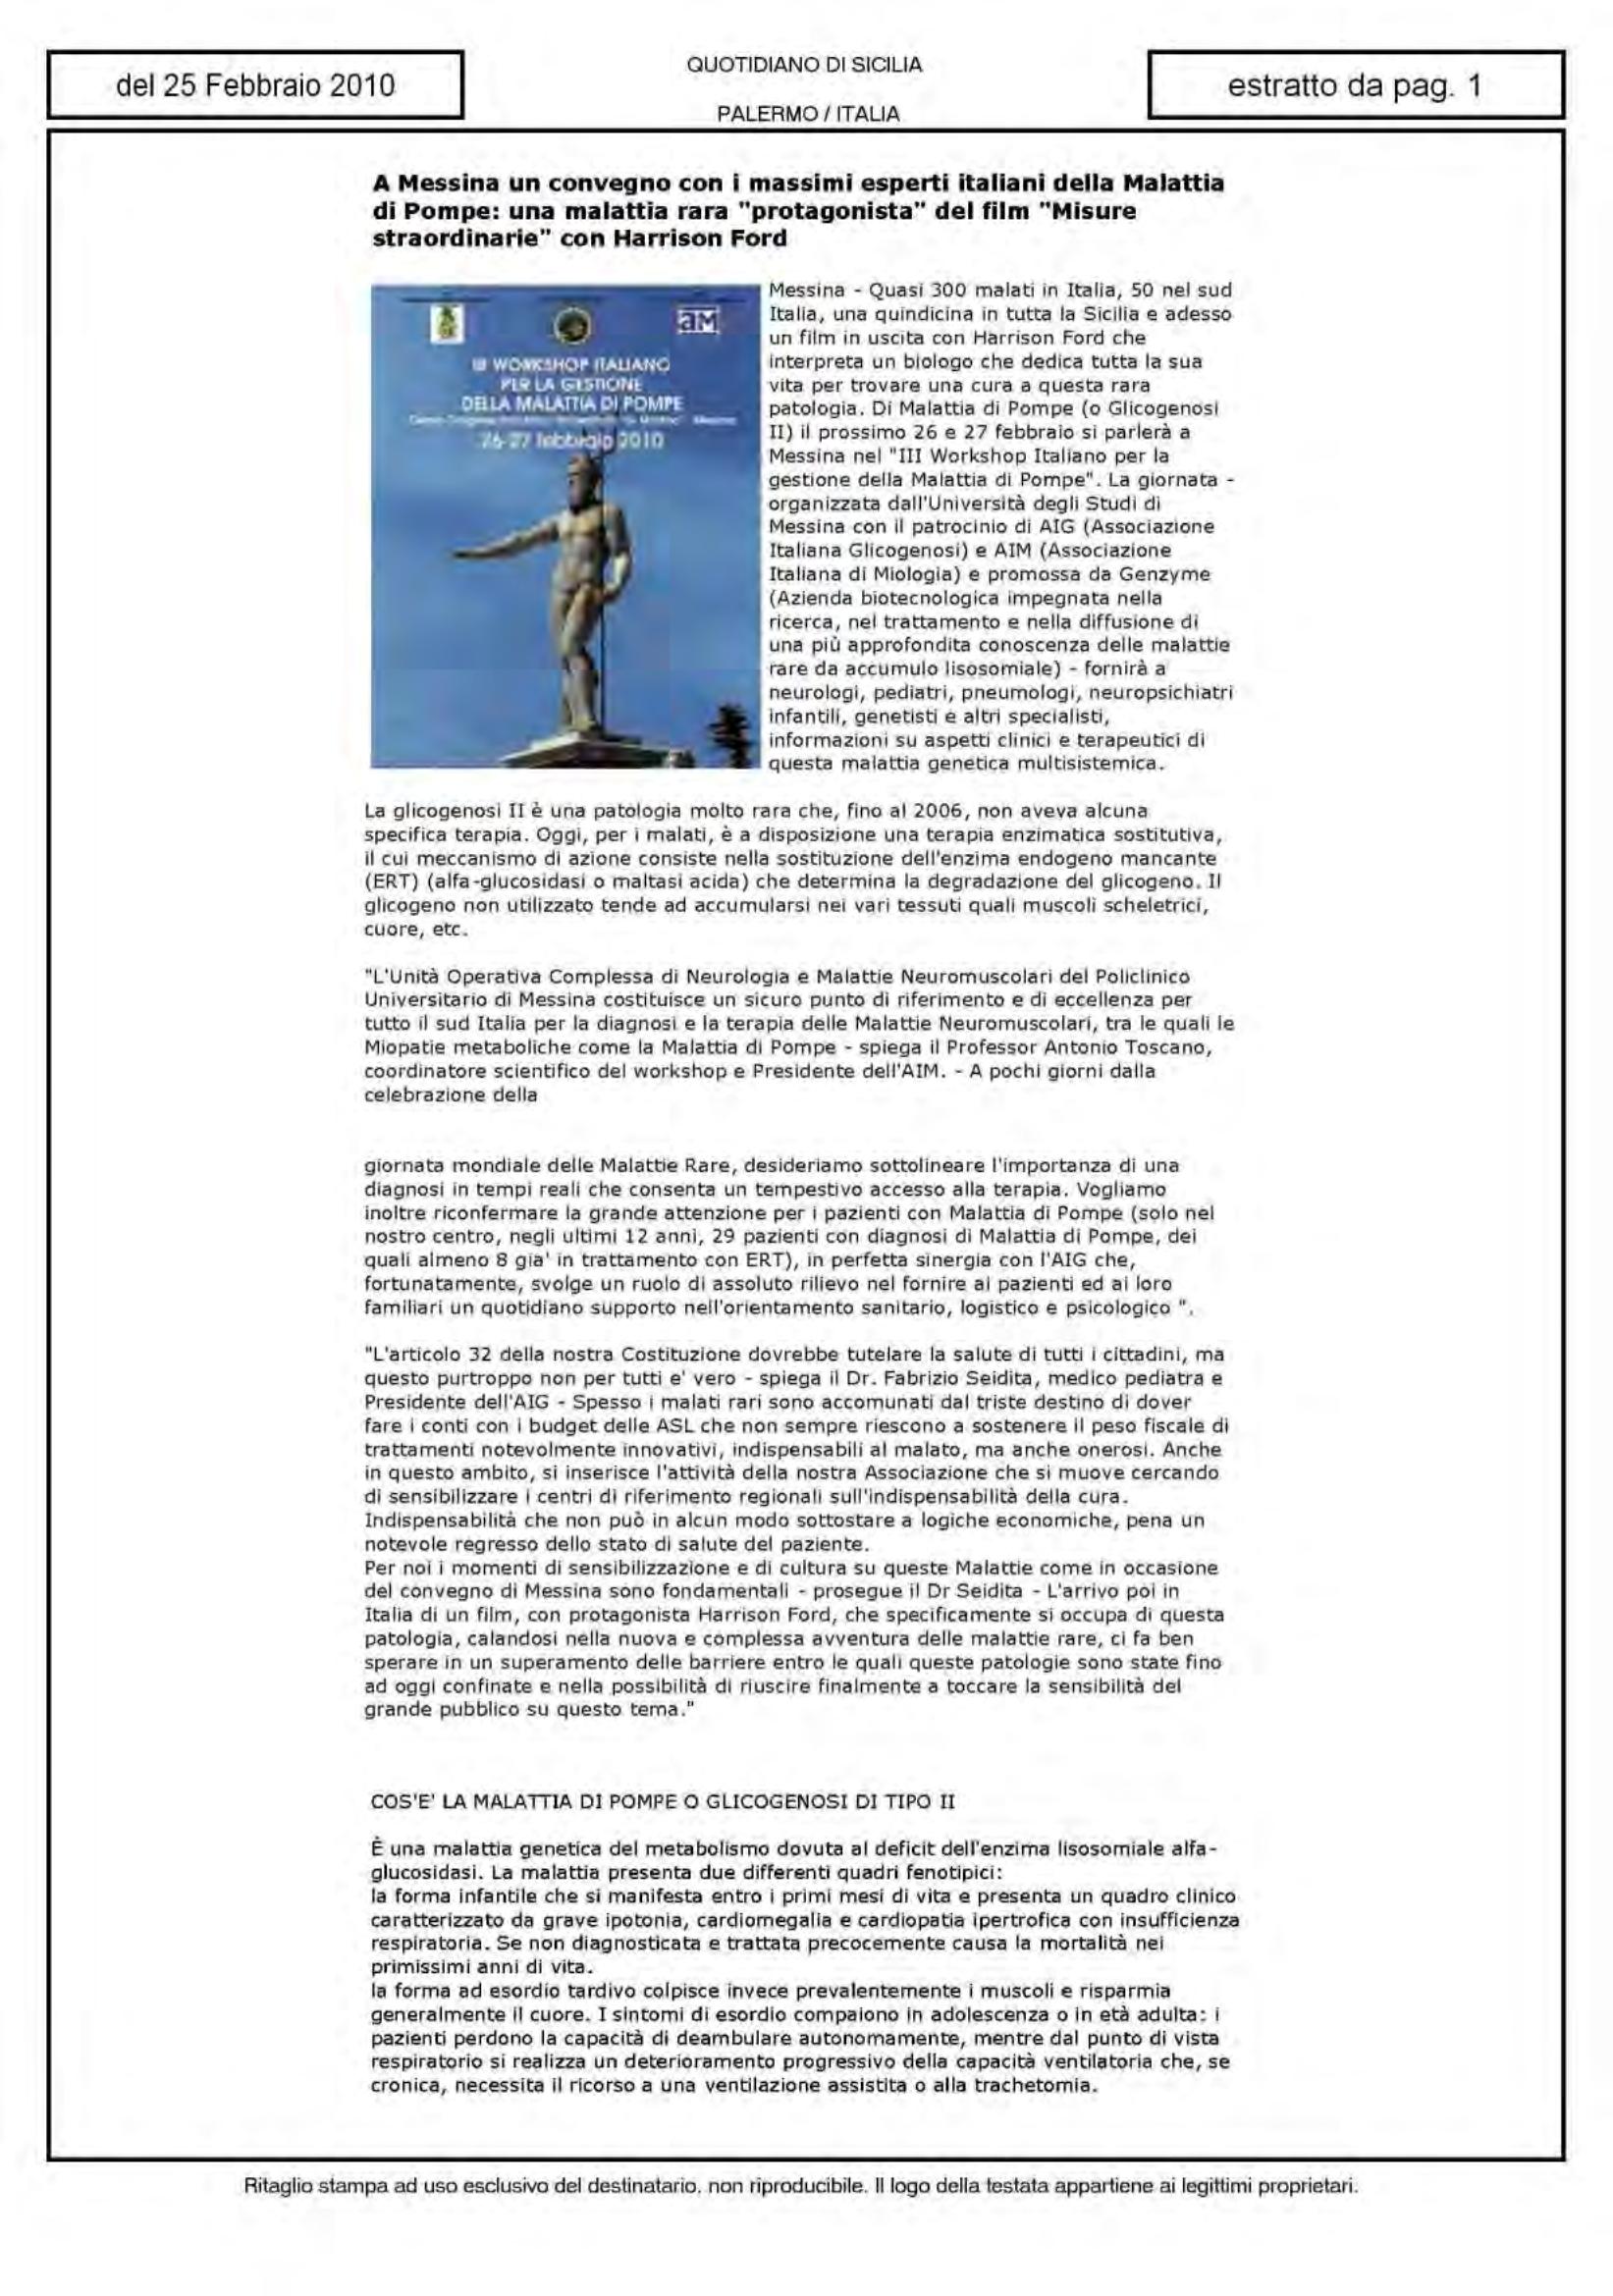 Stampa_20100422_misure straordinarie_Page_88